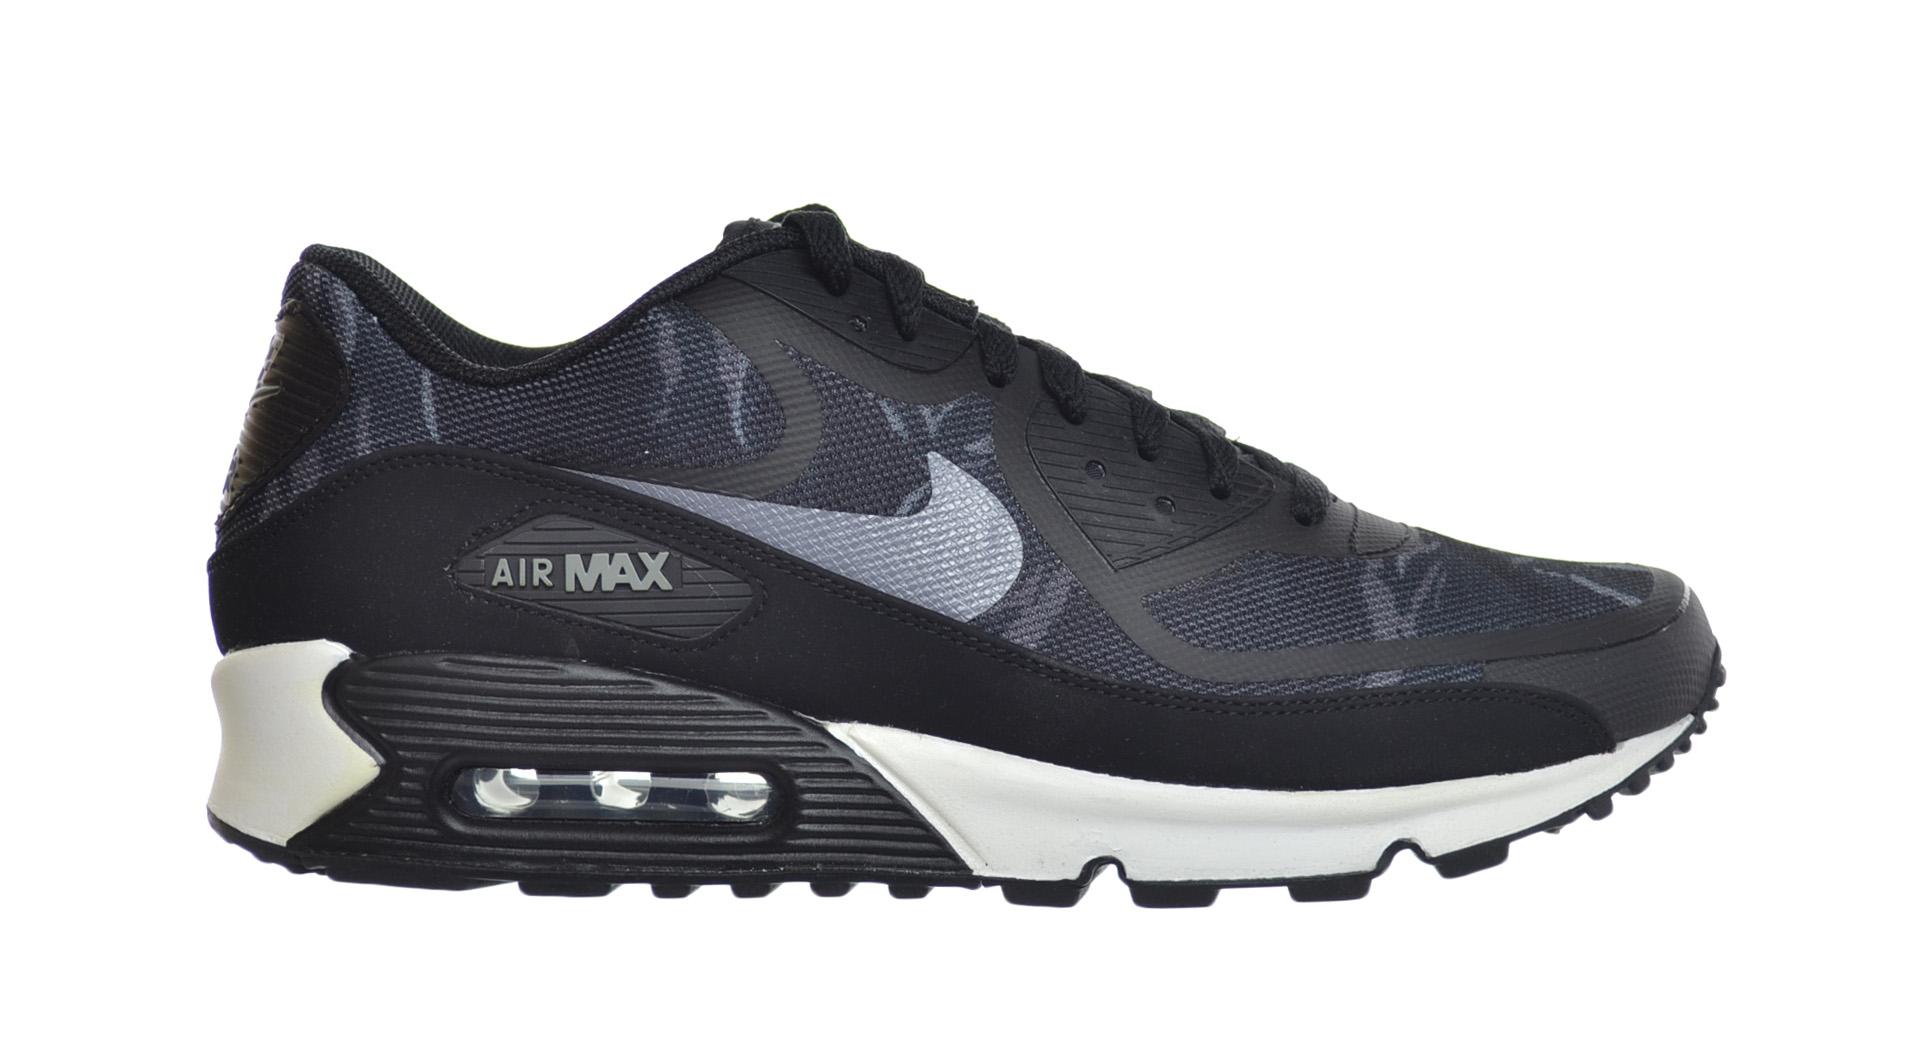 separation shoes aae8d 6c757 Details about Nike Air Max 90 Premium Tape Men s Shoes Black Cool Grey-White  599249-001